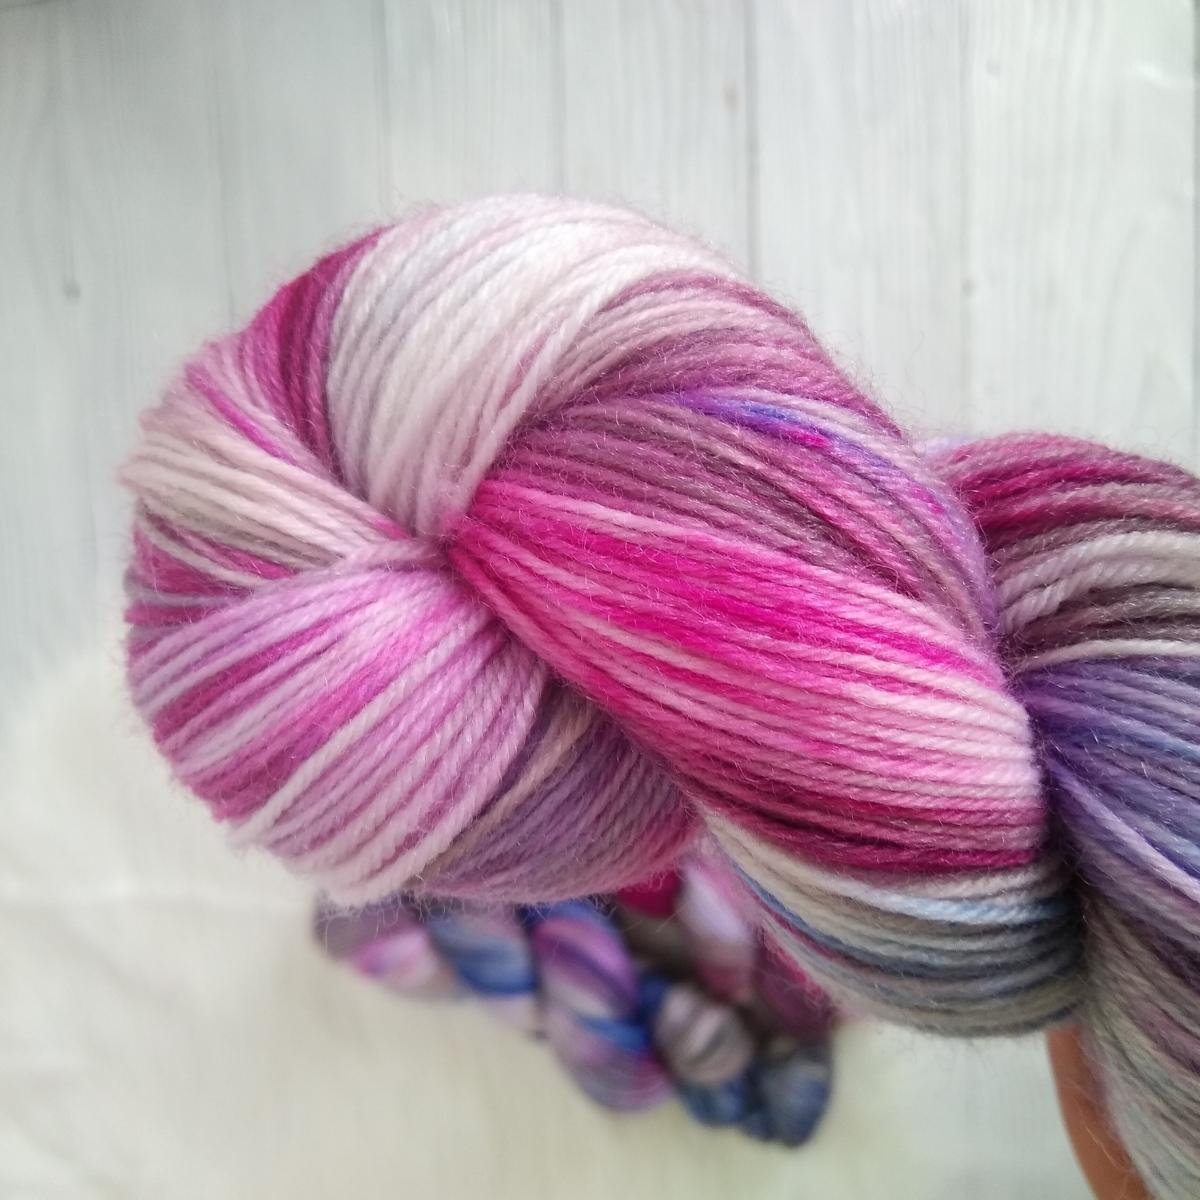 woodico.pro hand dyed yarn 034 4 1200x1200 - Hand dyed yarn / 034